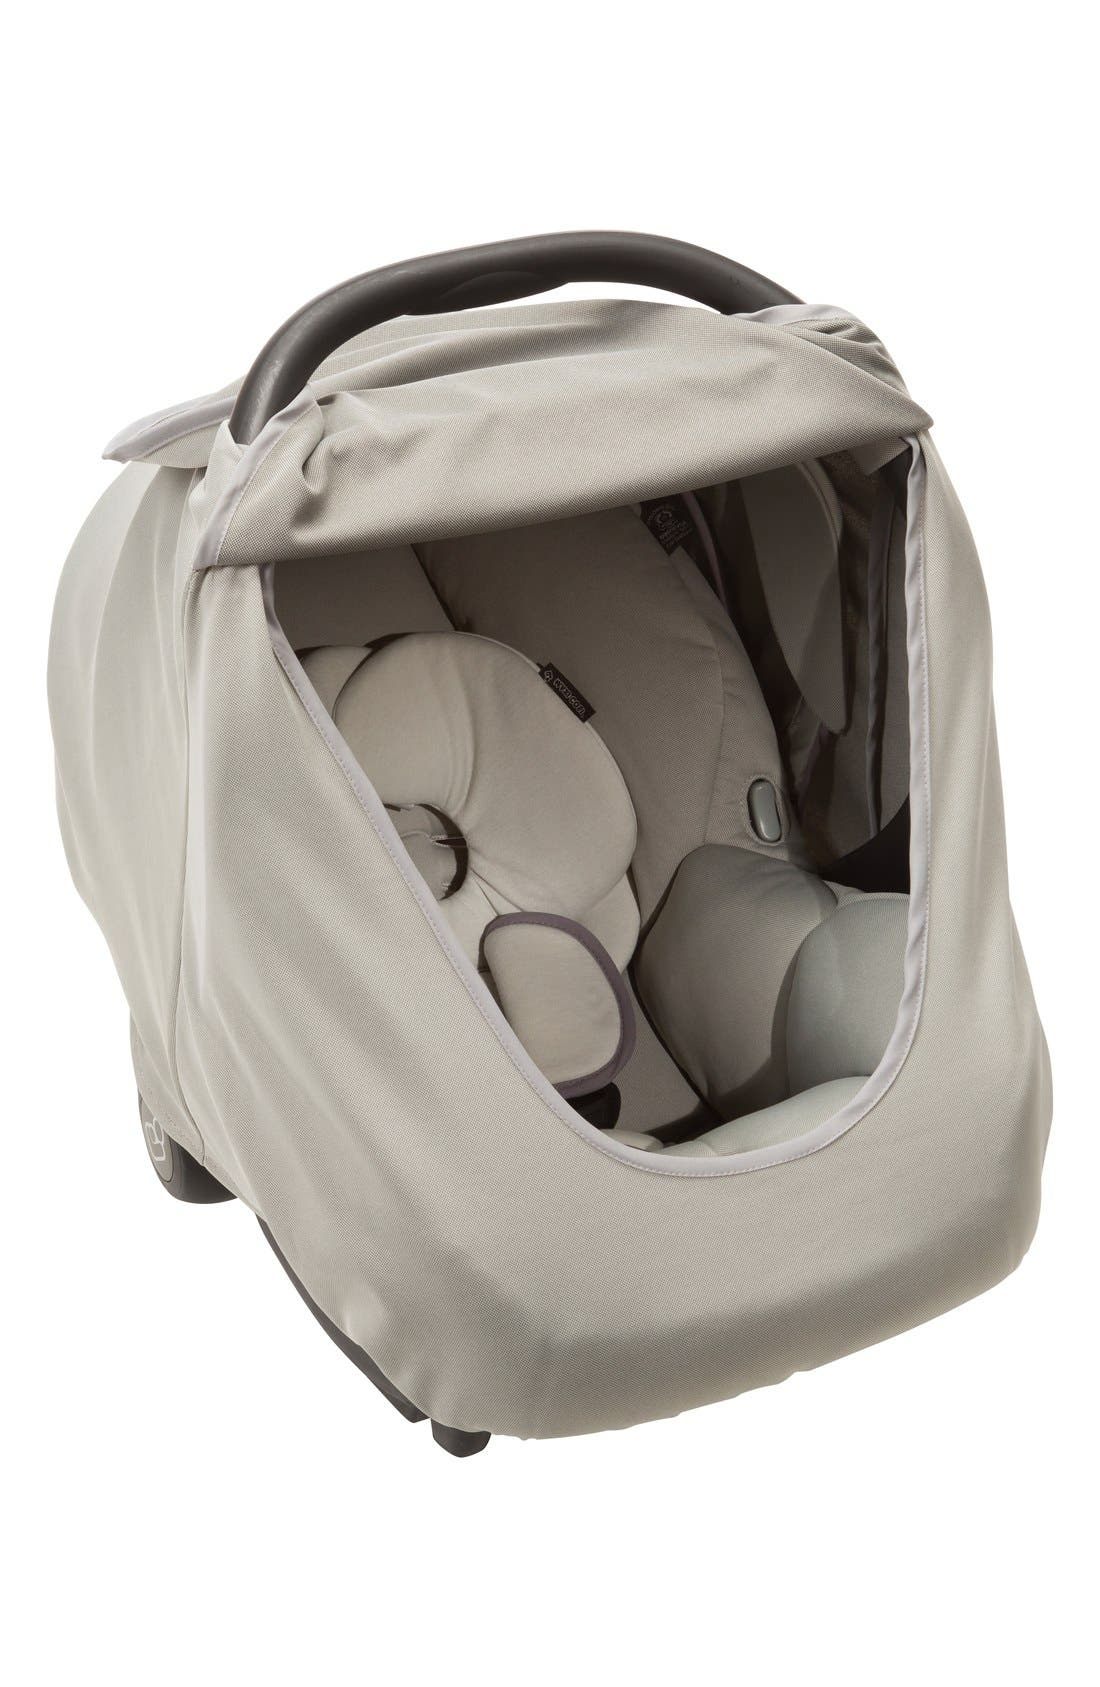 Main Image - Maxi-Cosi® Cover for Mico Car Seat